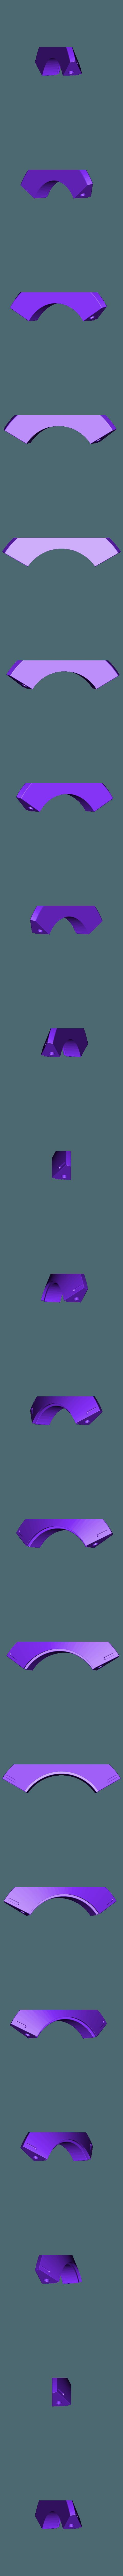 Part1-2.STL Download STL file Tracer pulse bomb. • 3D printable design, Cosple